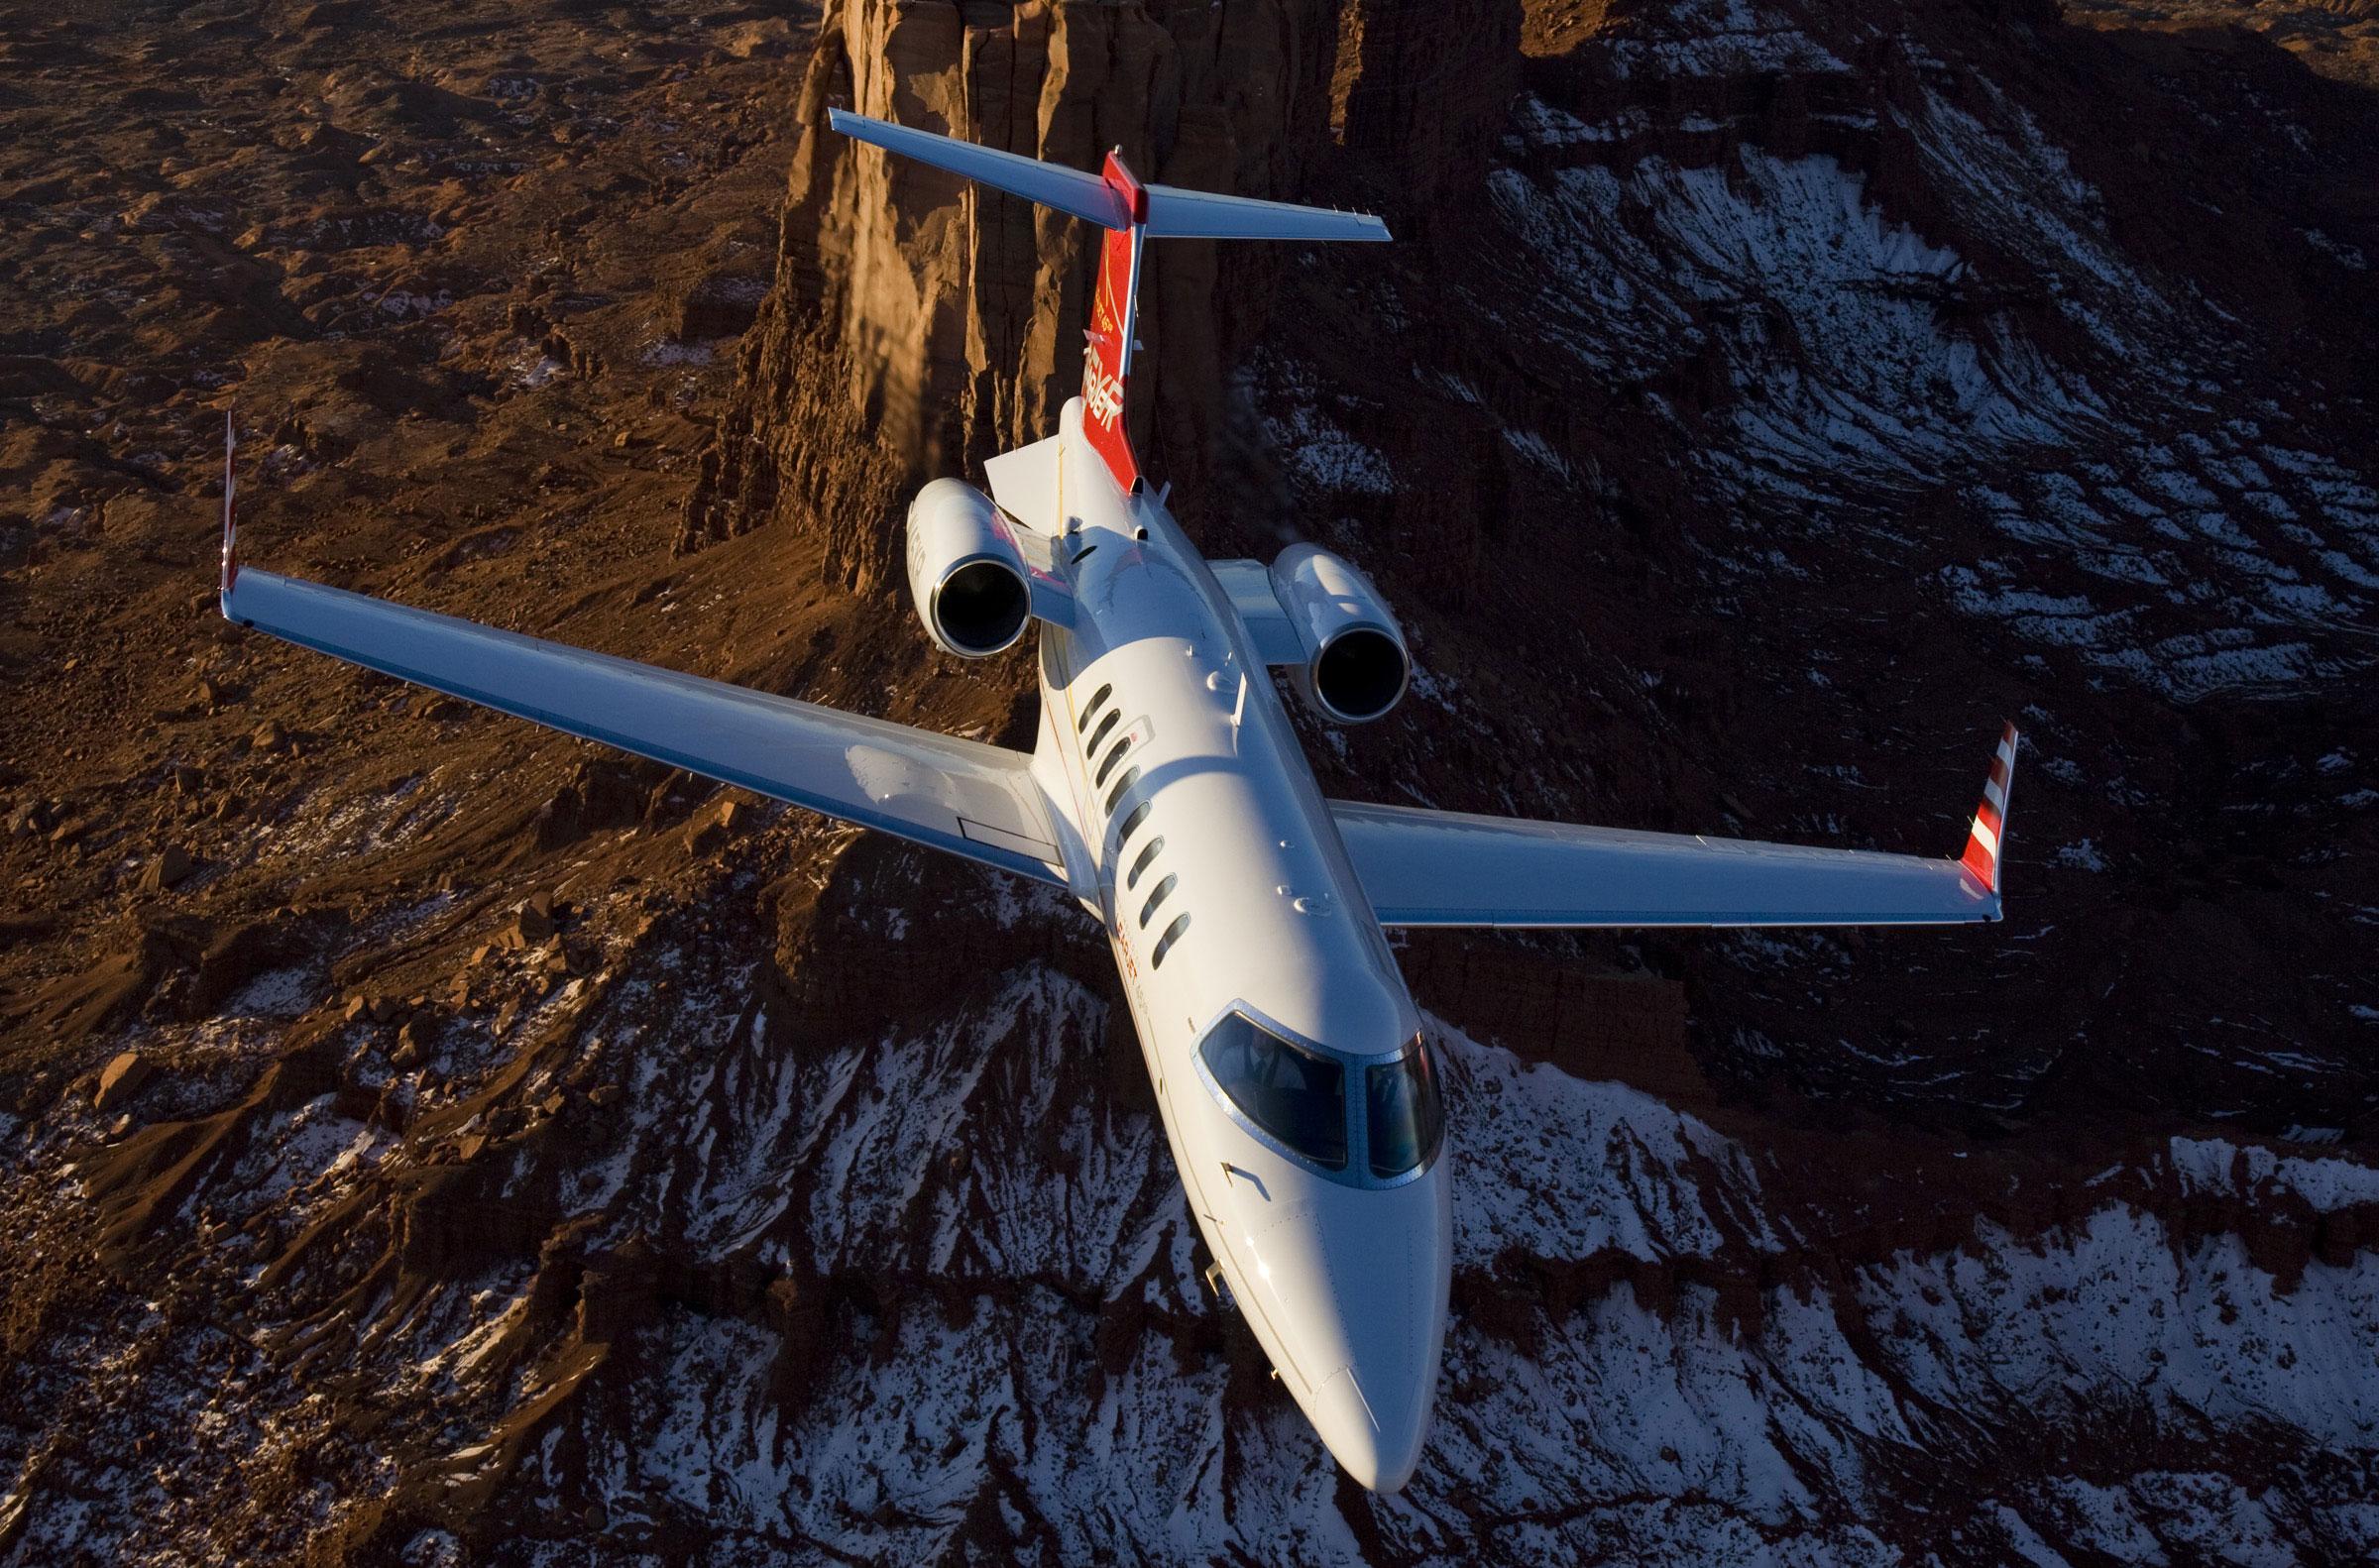 Bombardier-learjet-45-hire-private-plane